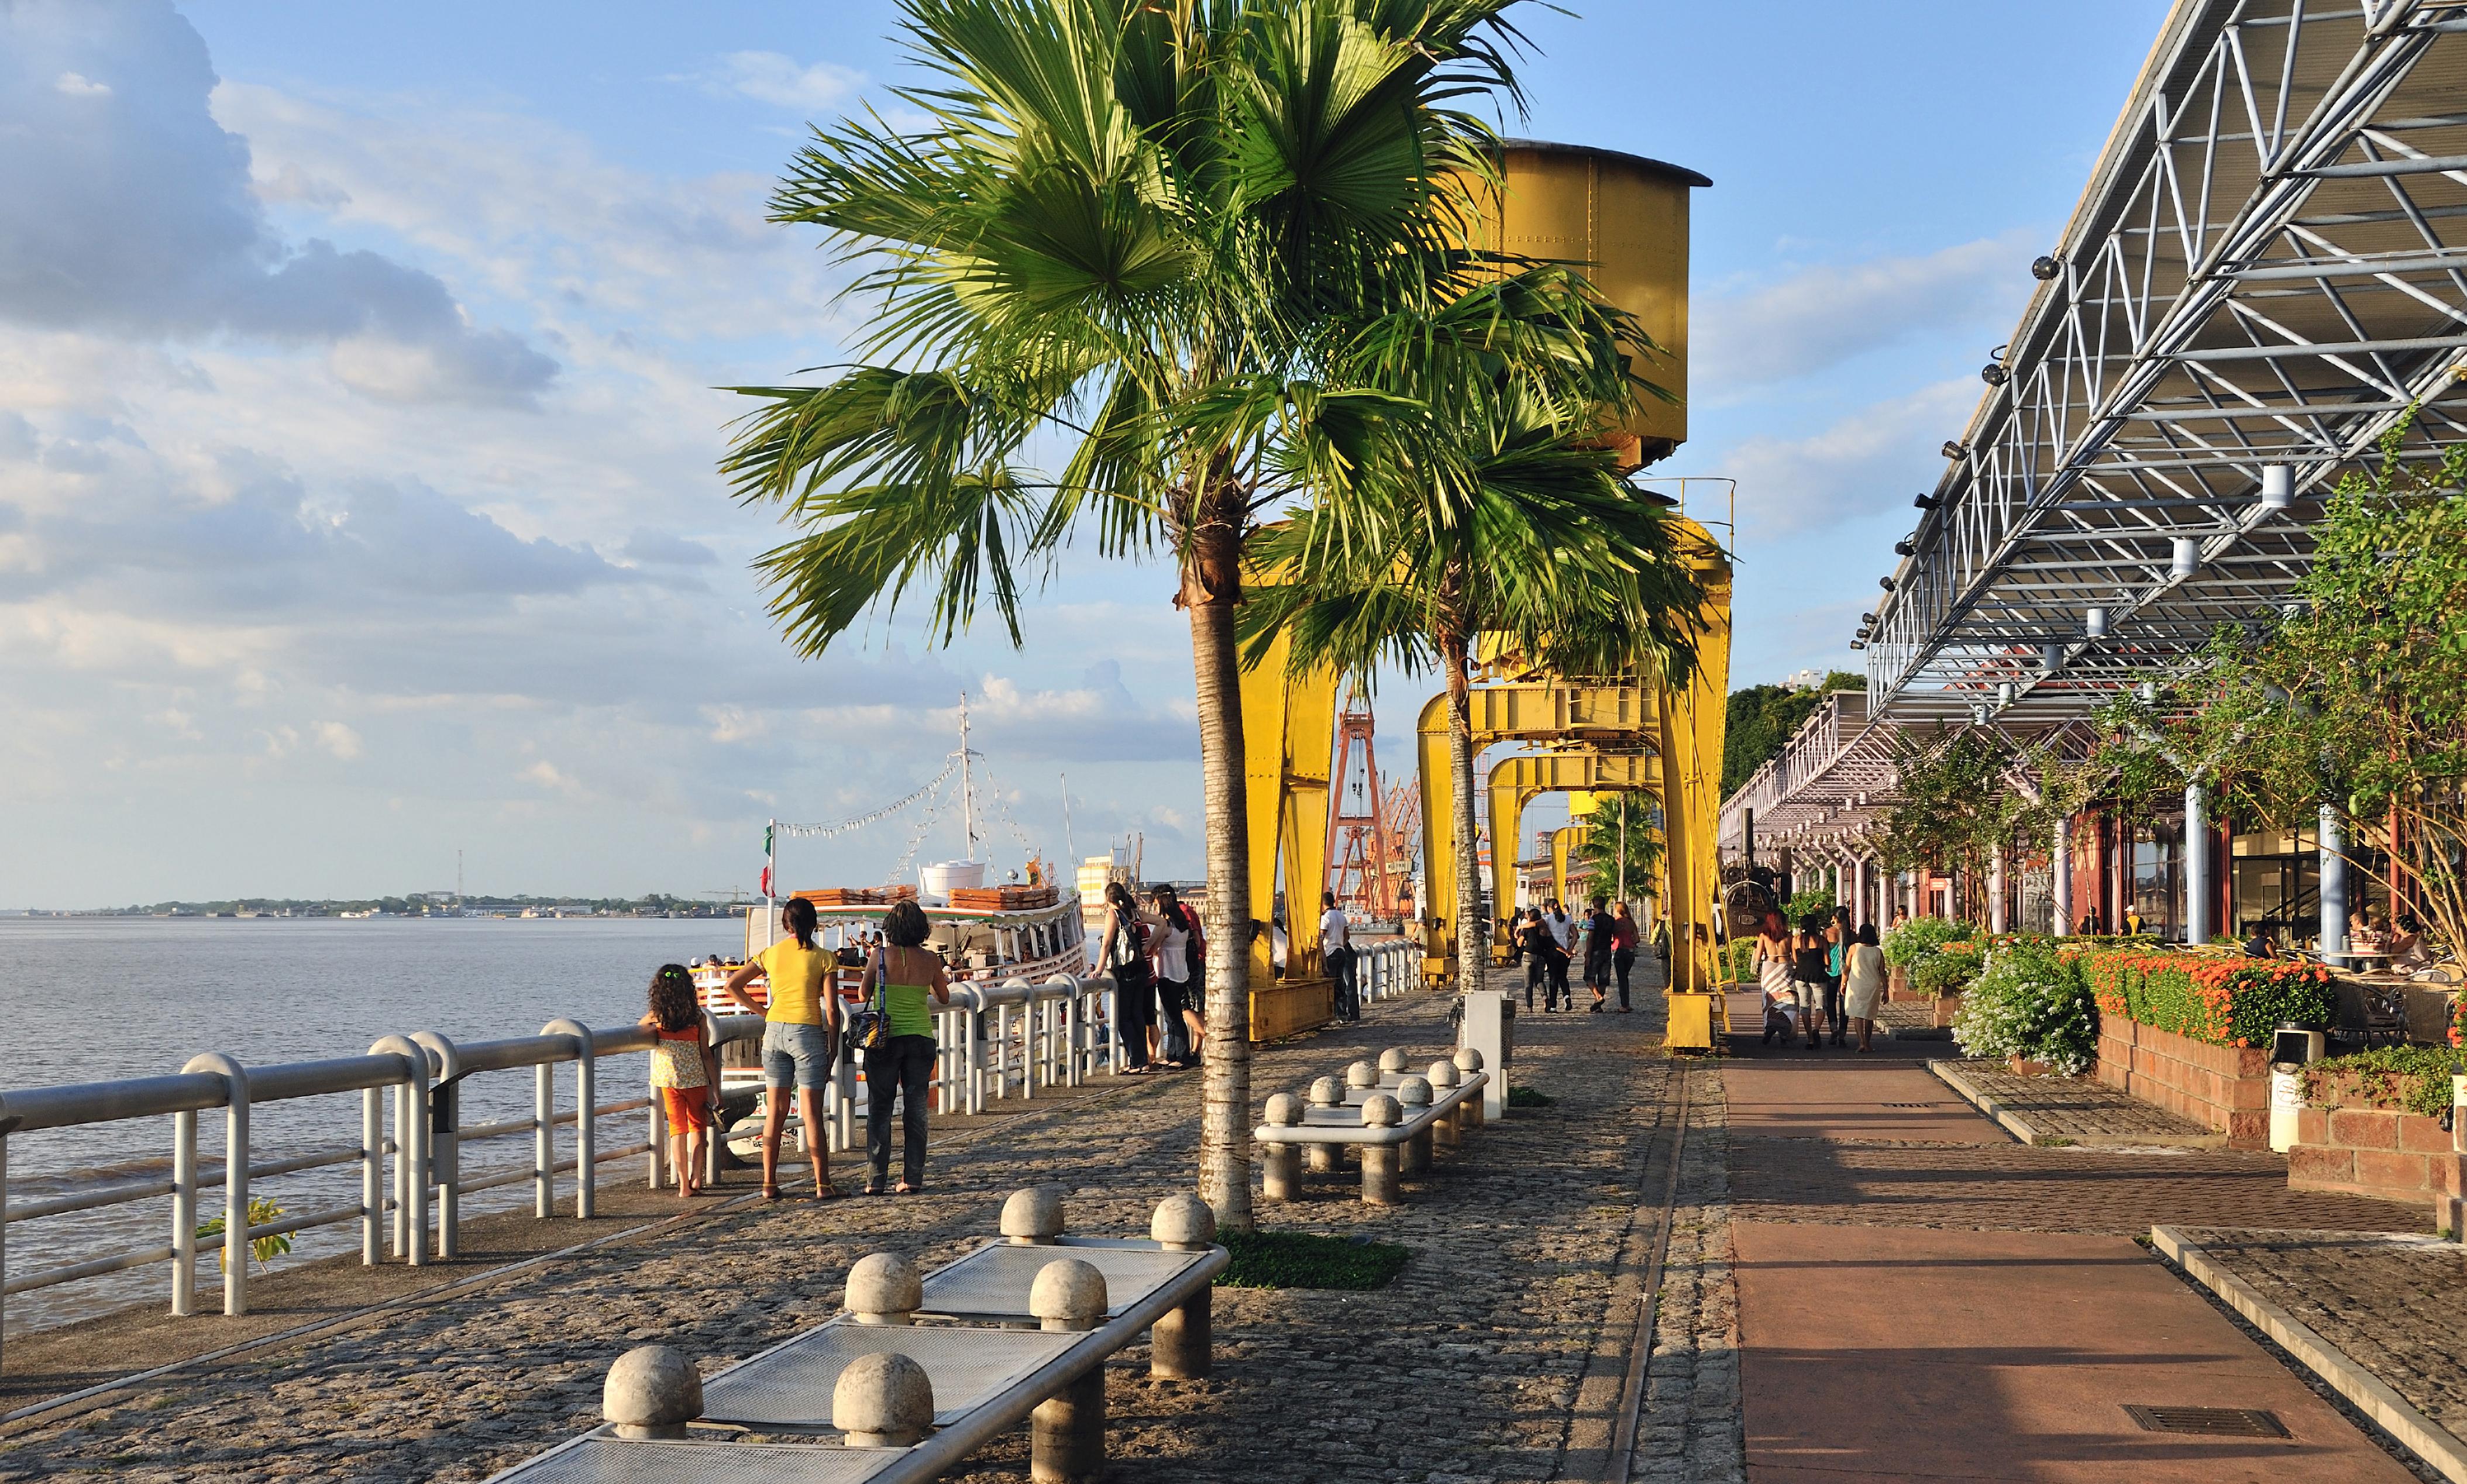 places Aktiviteter i Belem Brazil